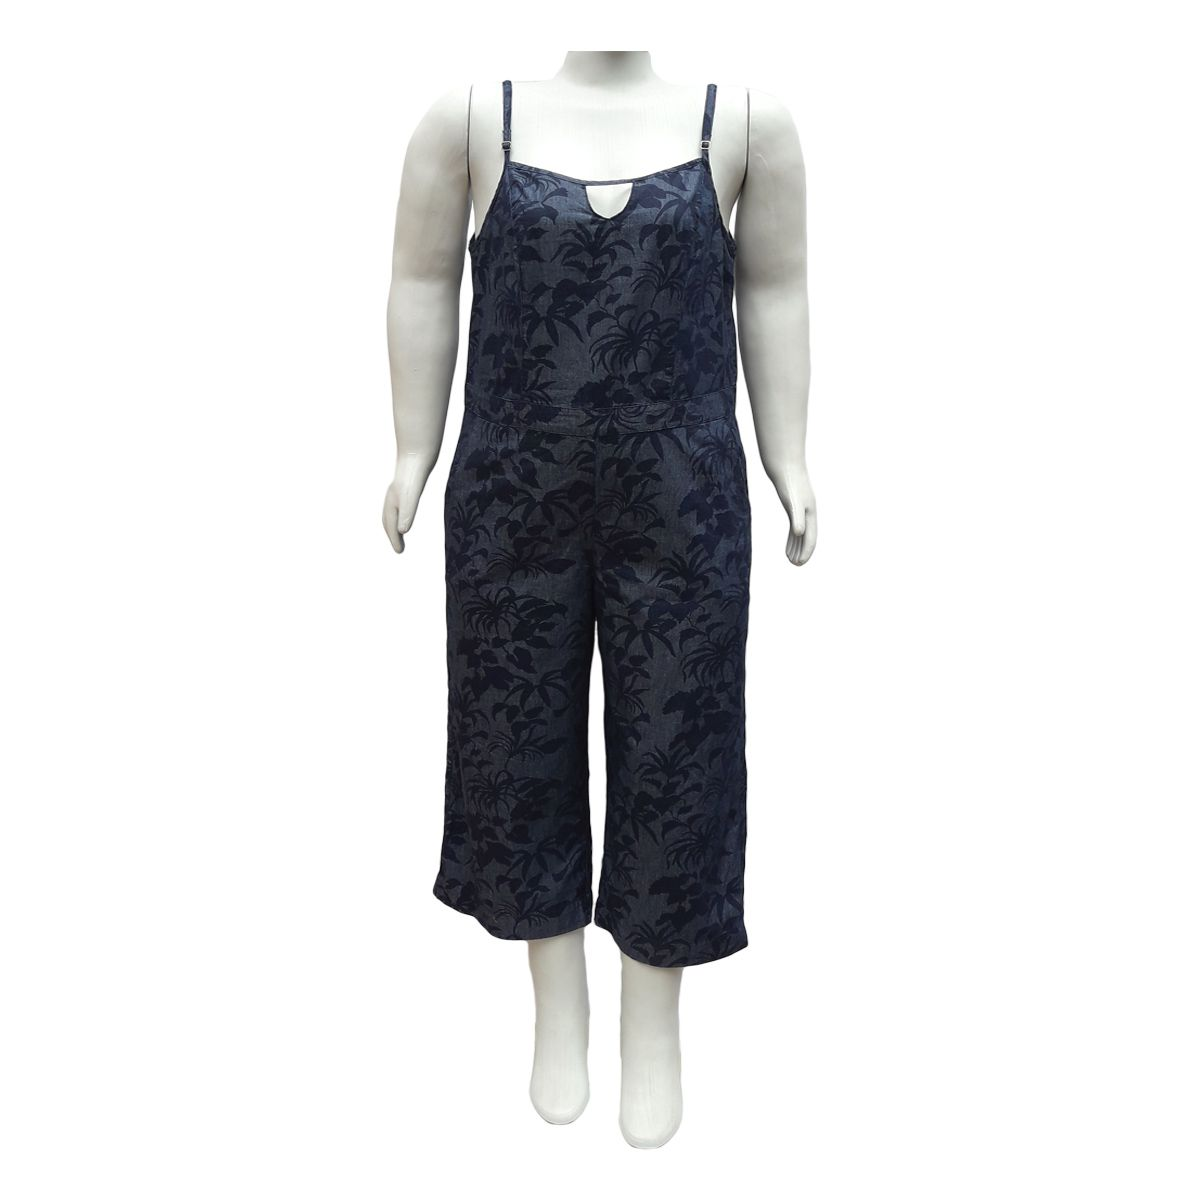 Macacão Pantacourt Jeans Plus Size